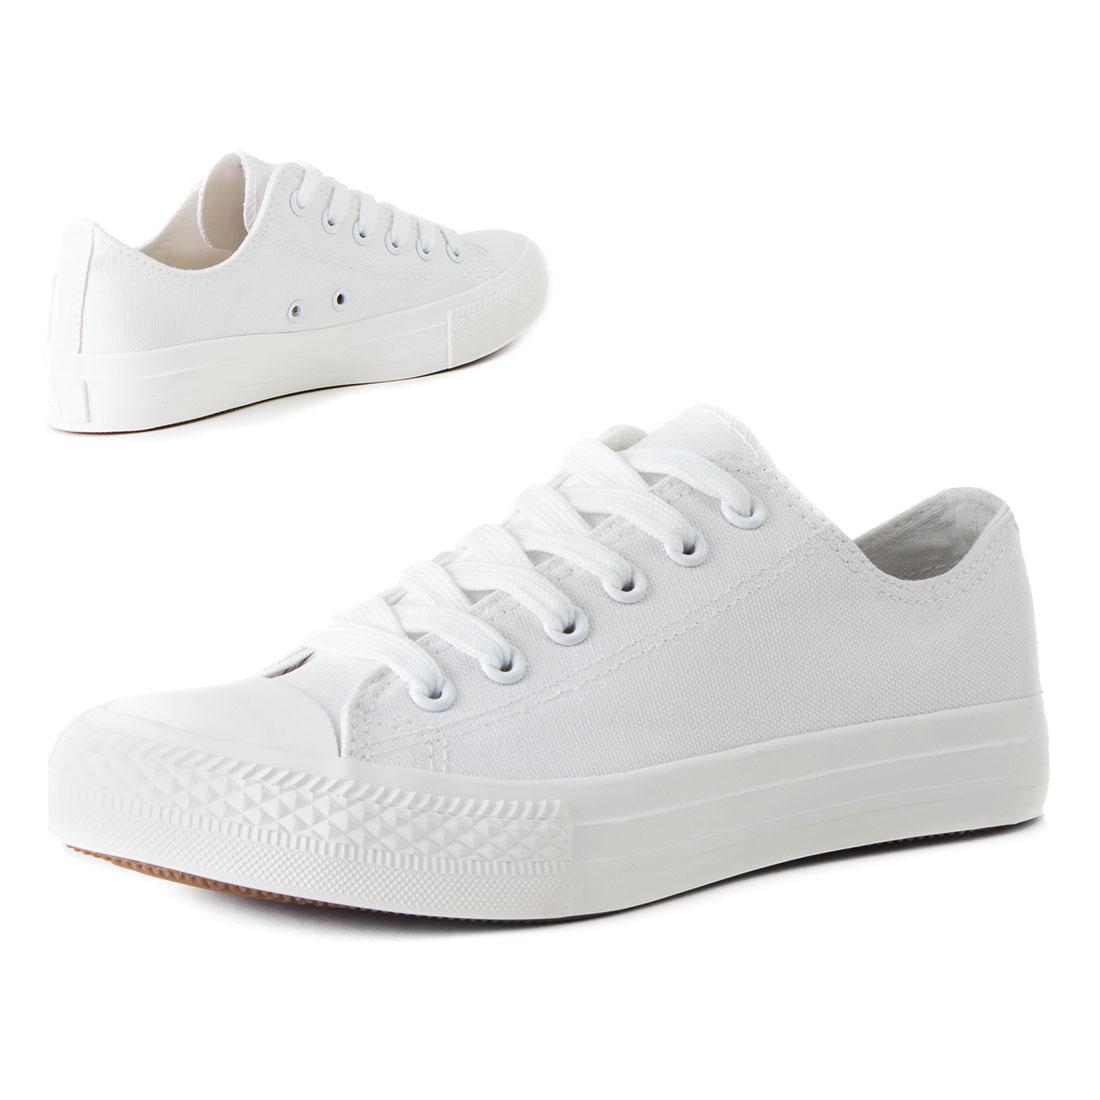 Aktuelle Damen Freizeitschuhe Schuh Sneakers Turnschuhe Sportschuhe 9032 Blau 38